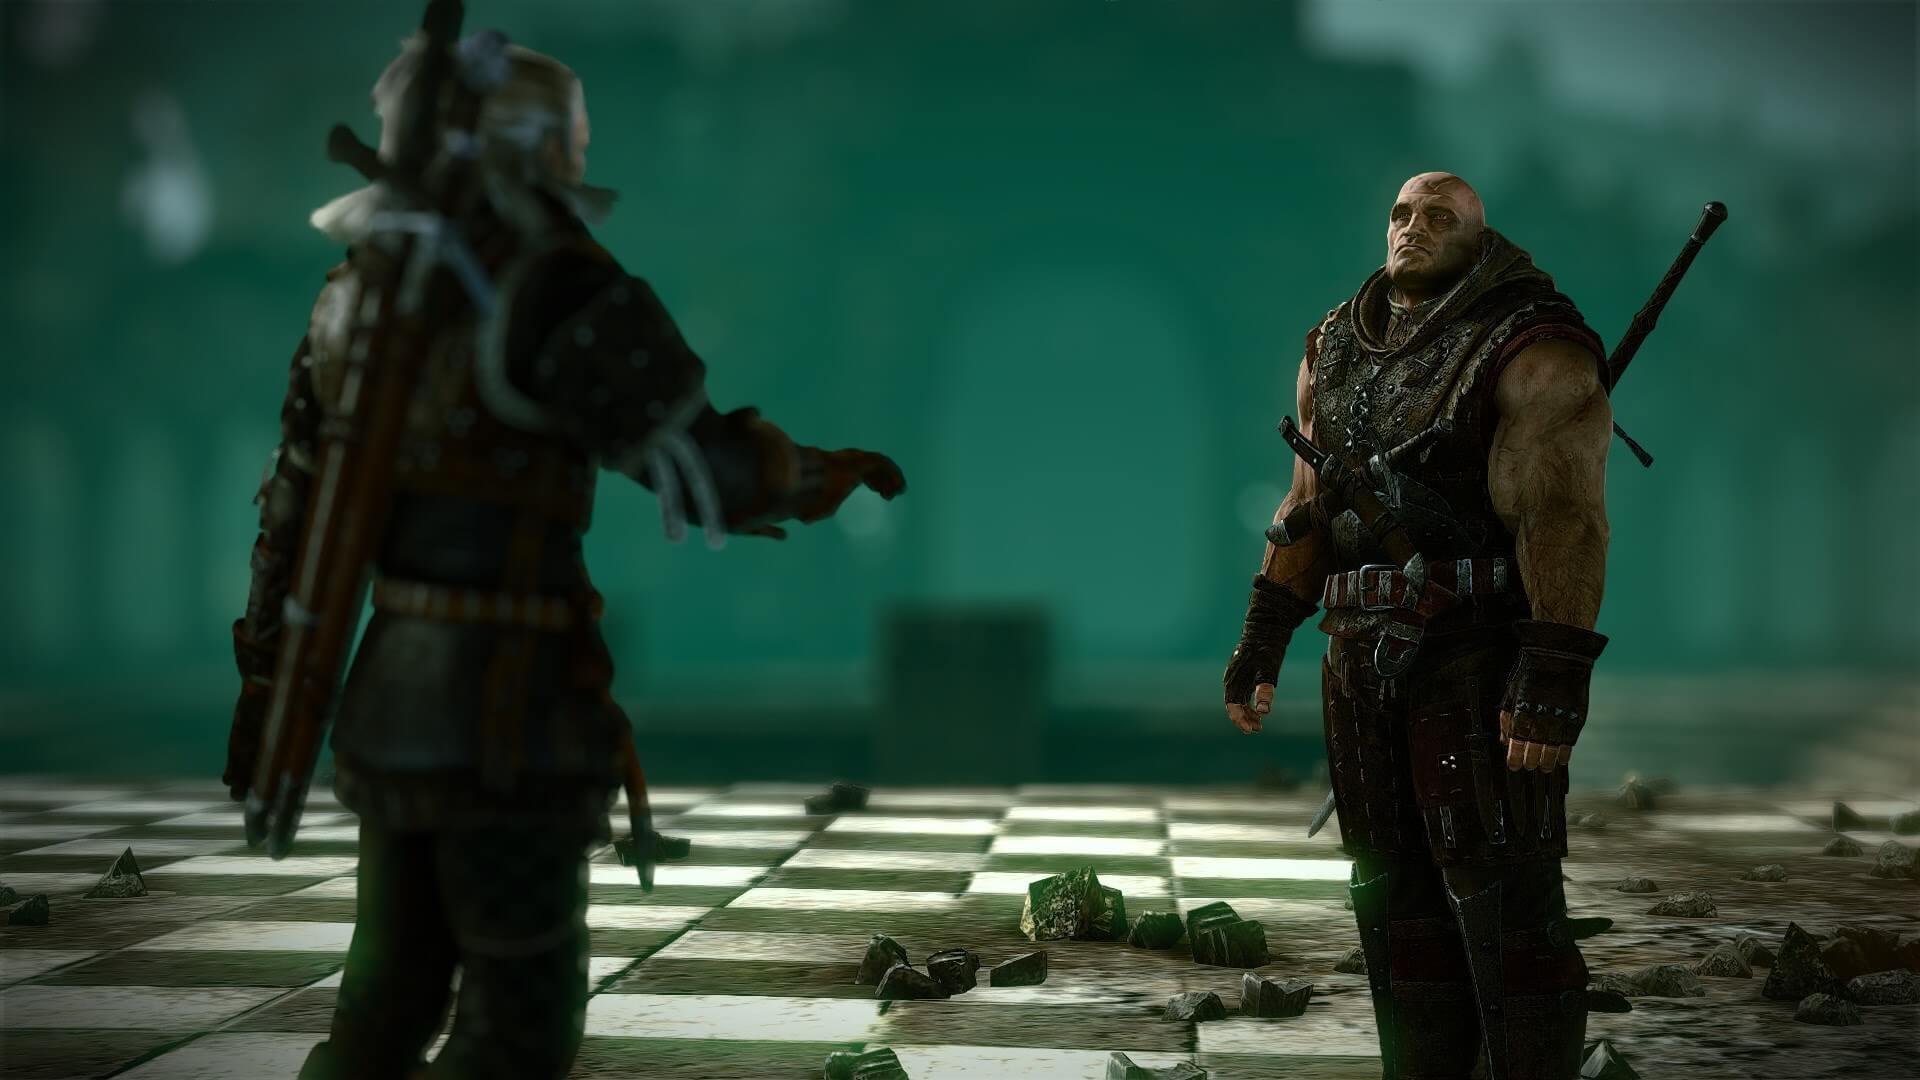 Geraltはレソに事の真相を明かされる。『ウィッチャー2 王の暗殺者』より。